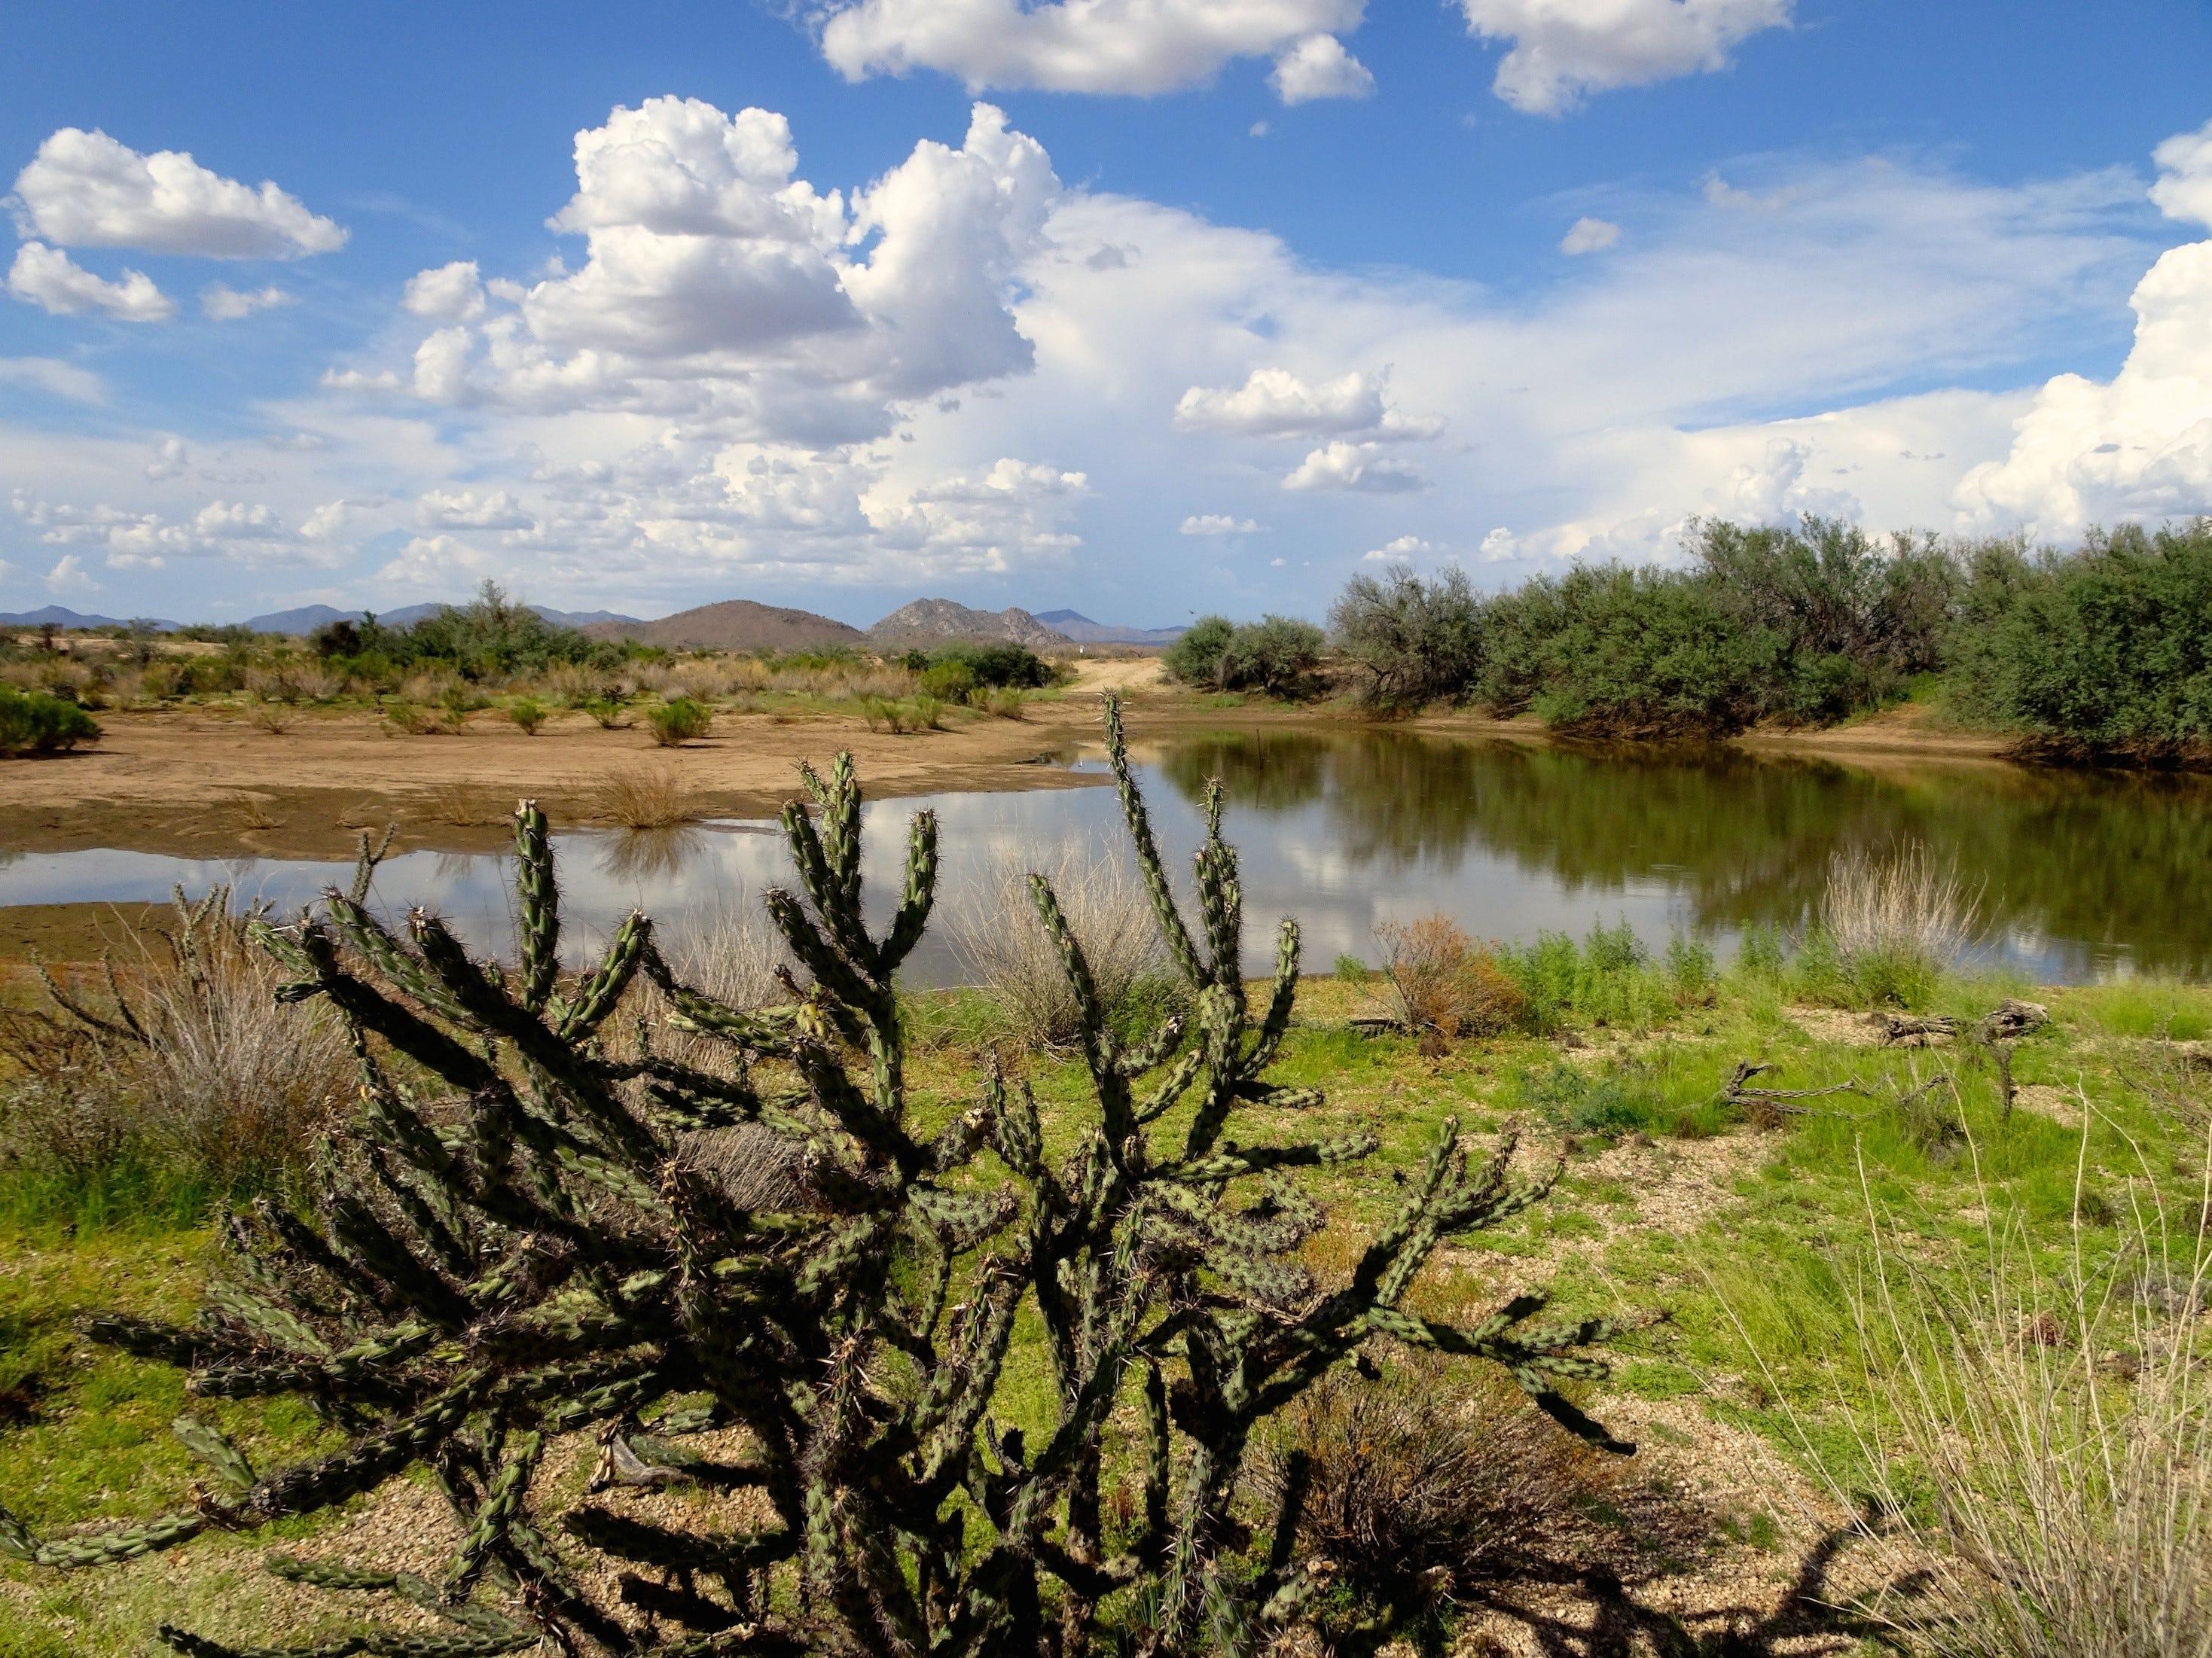 The Gooseneck Trail skirts the edge of a seasonal pond.